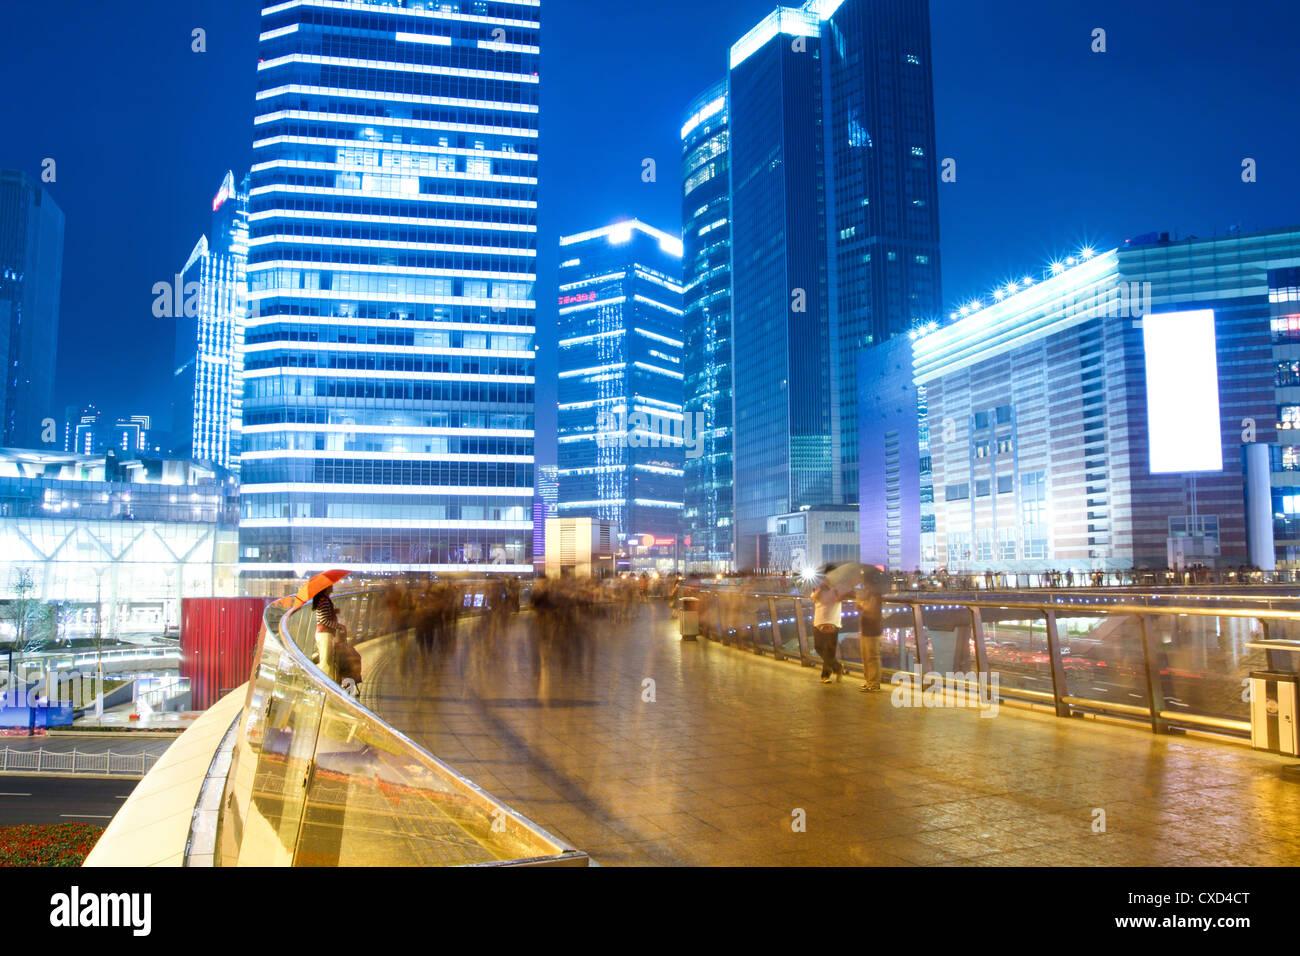 night view of prosperous city - Stock Image